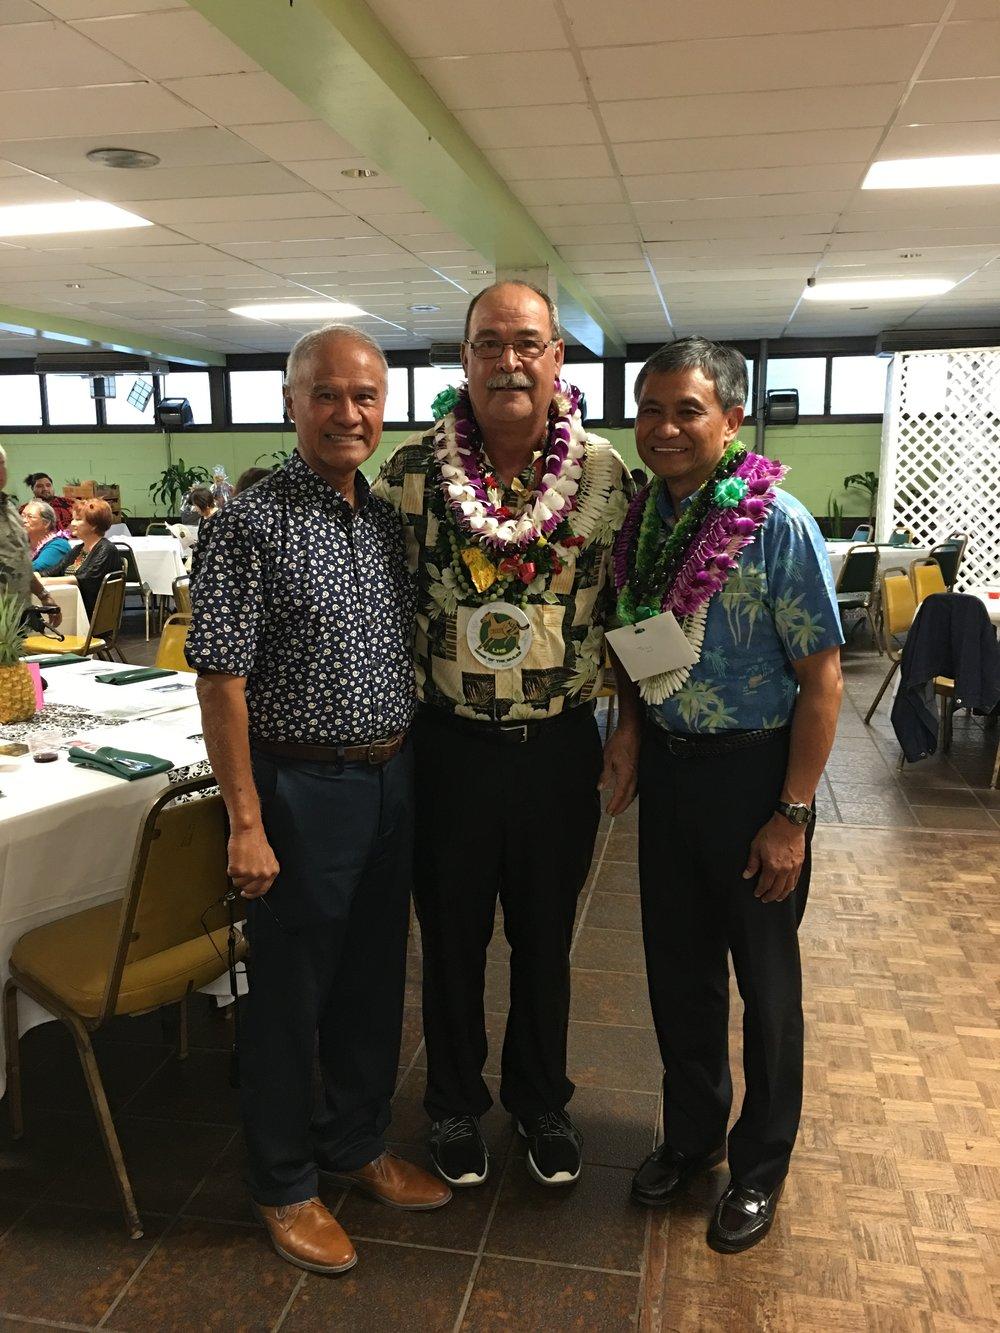 Bobby Bunda, Dr. Alex Kaloi, and General Anthony Taguba